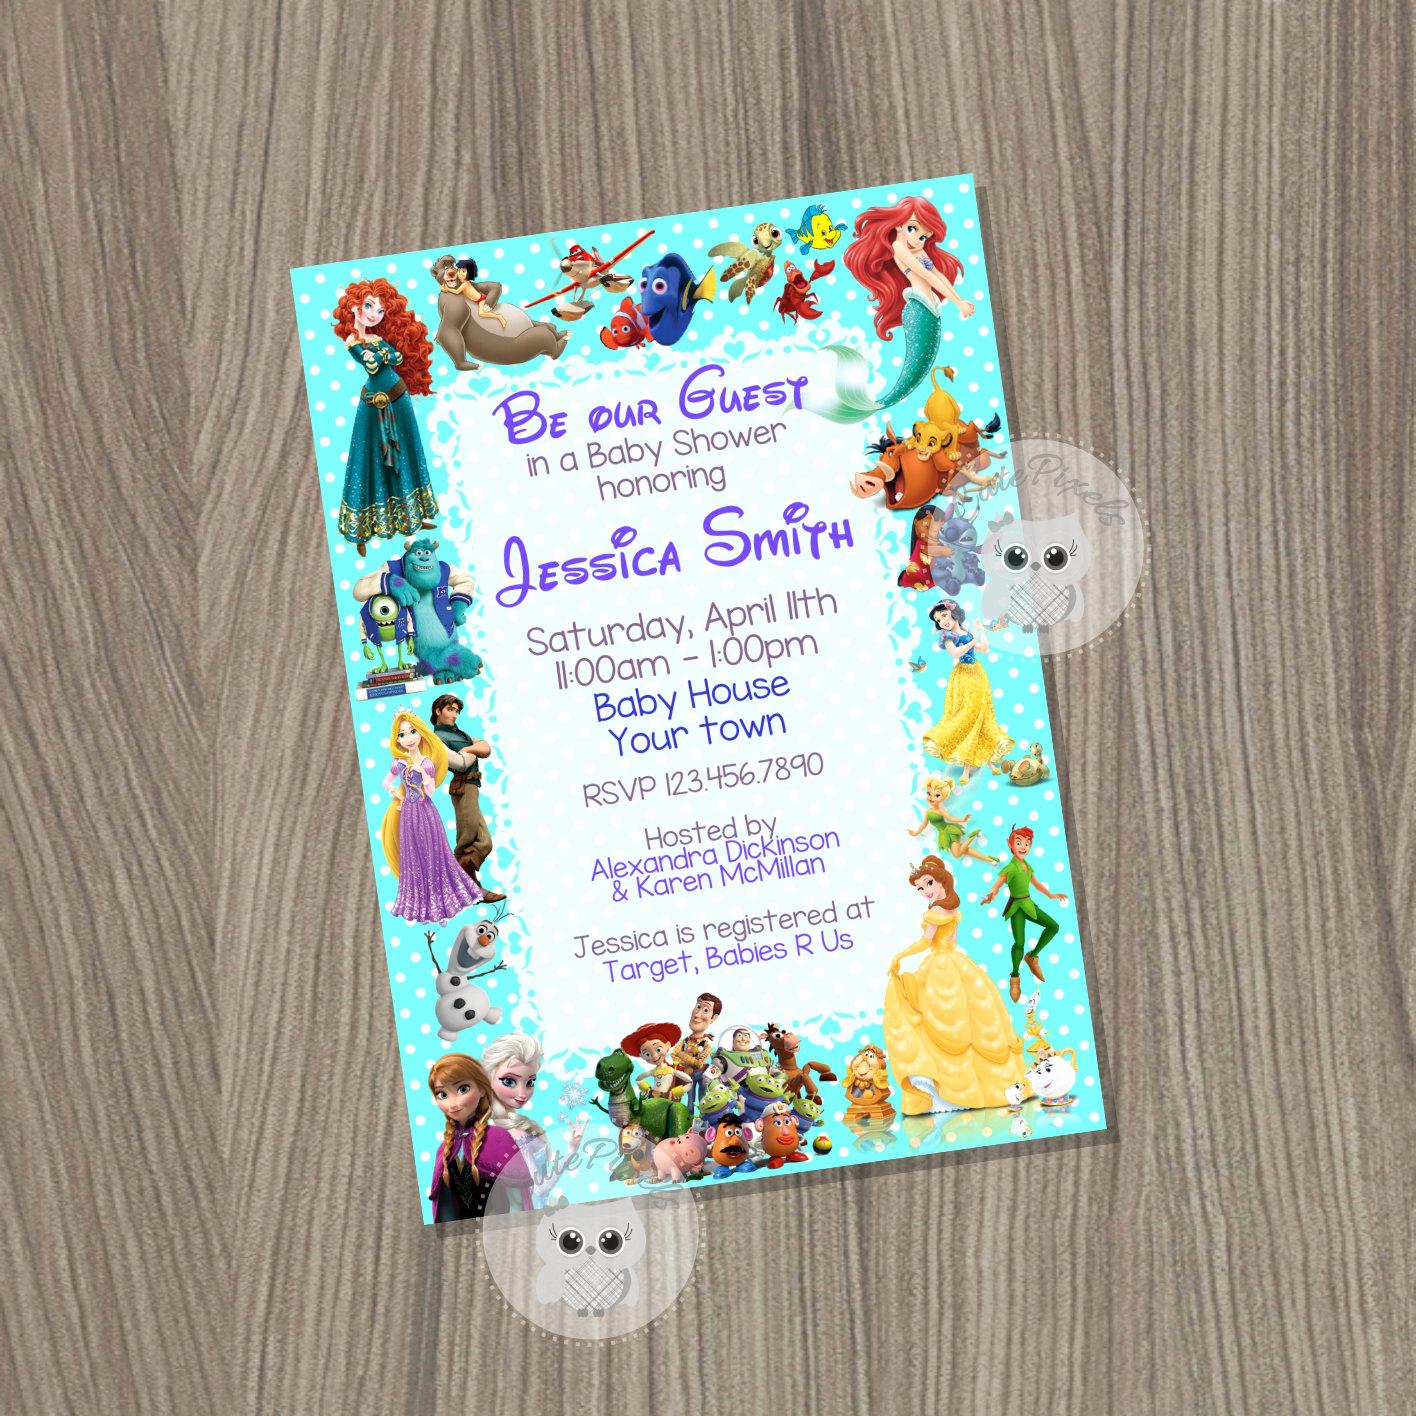 Disney Baby Shower Invitations Best Of Baby Shower Invitation Disney Baby Shower Baby Shower Baby